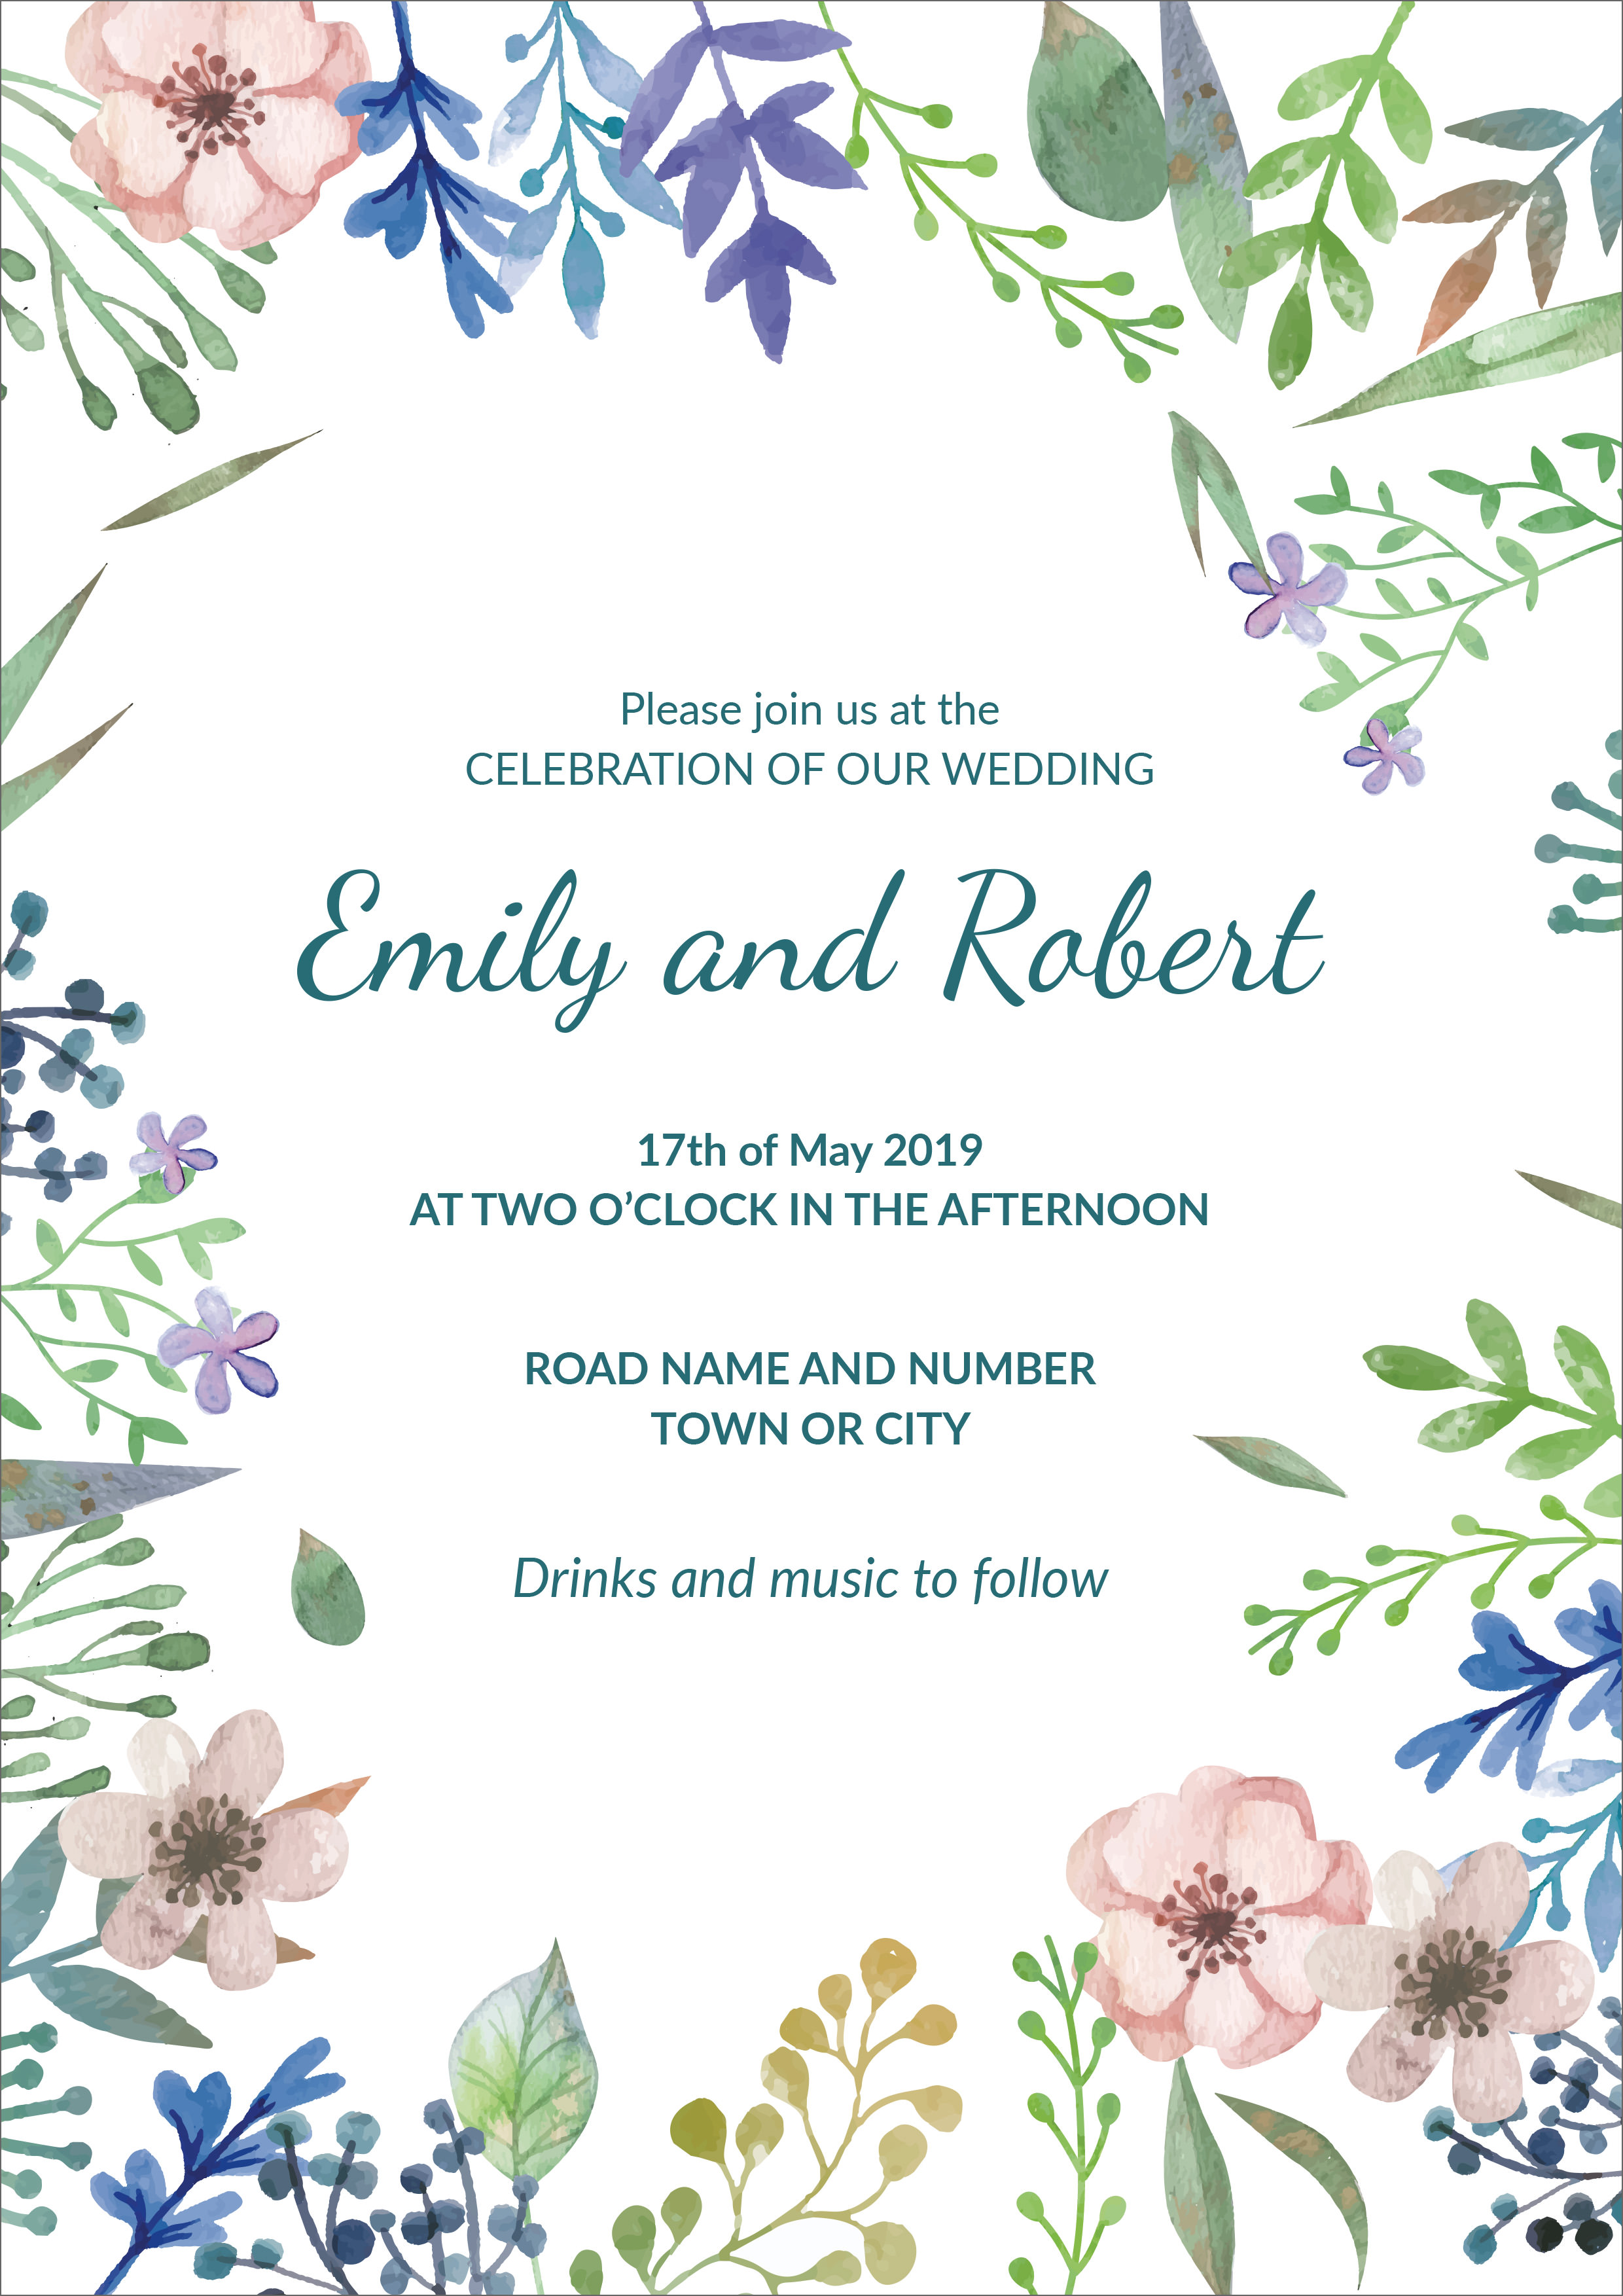 30 Free Wedding Invitation Template Cards - Printable And Editable PSD